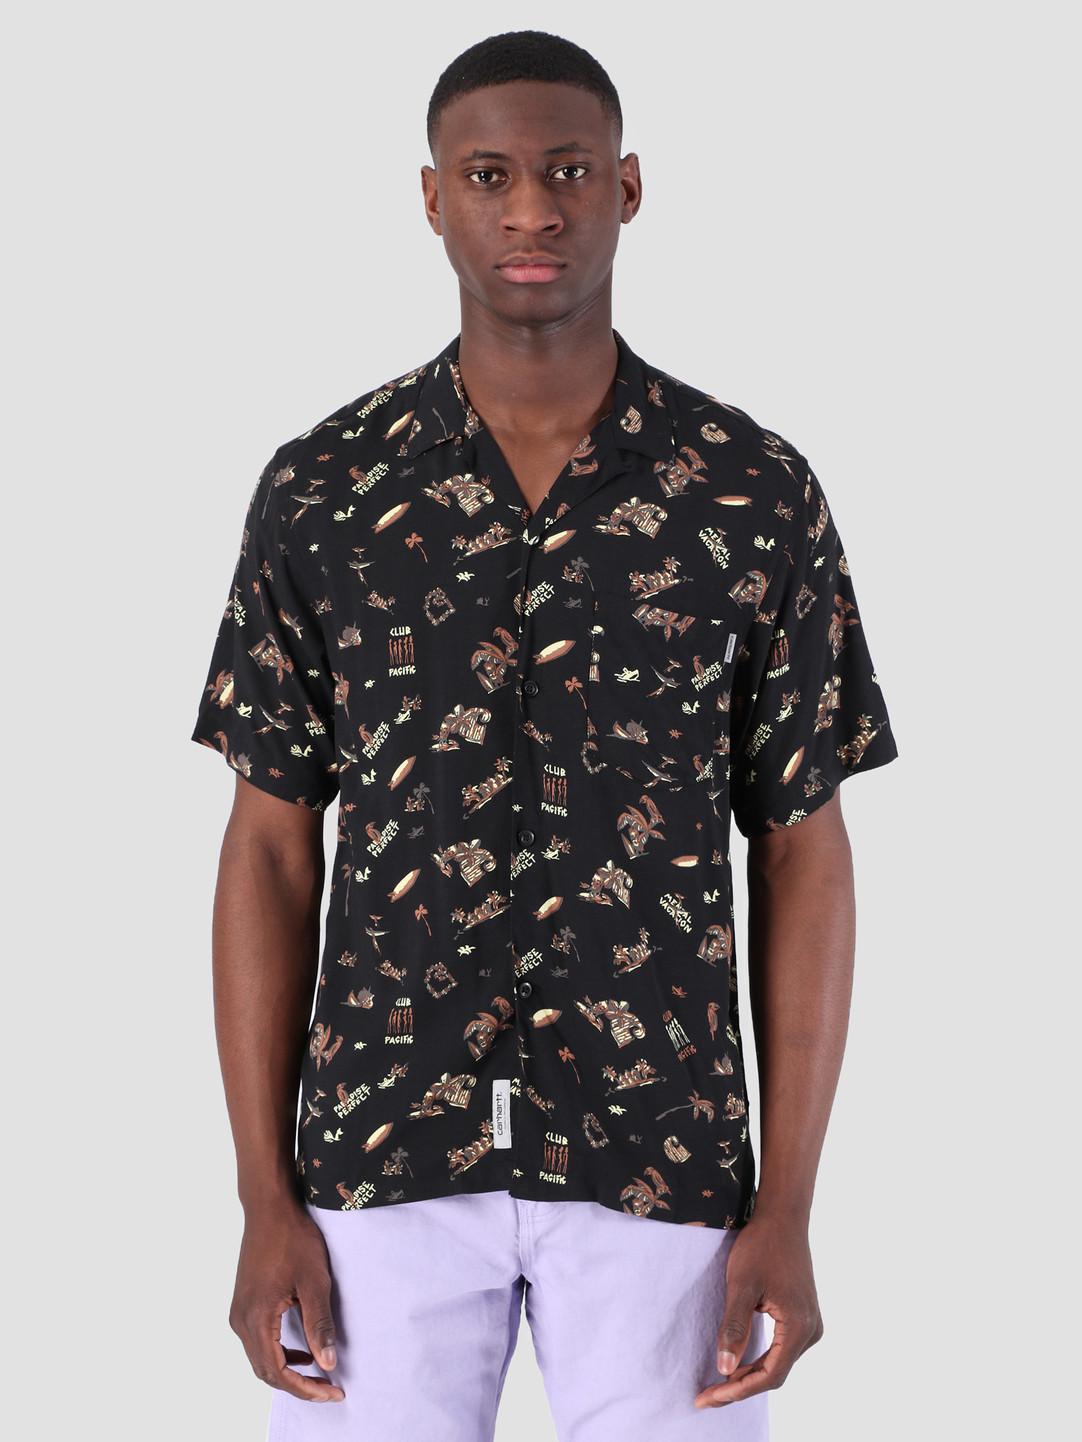 Carhartt WIP Carhartt WIP Short Sleeve Club Pacific Shirt Club Pacific Print Black 62053000